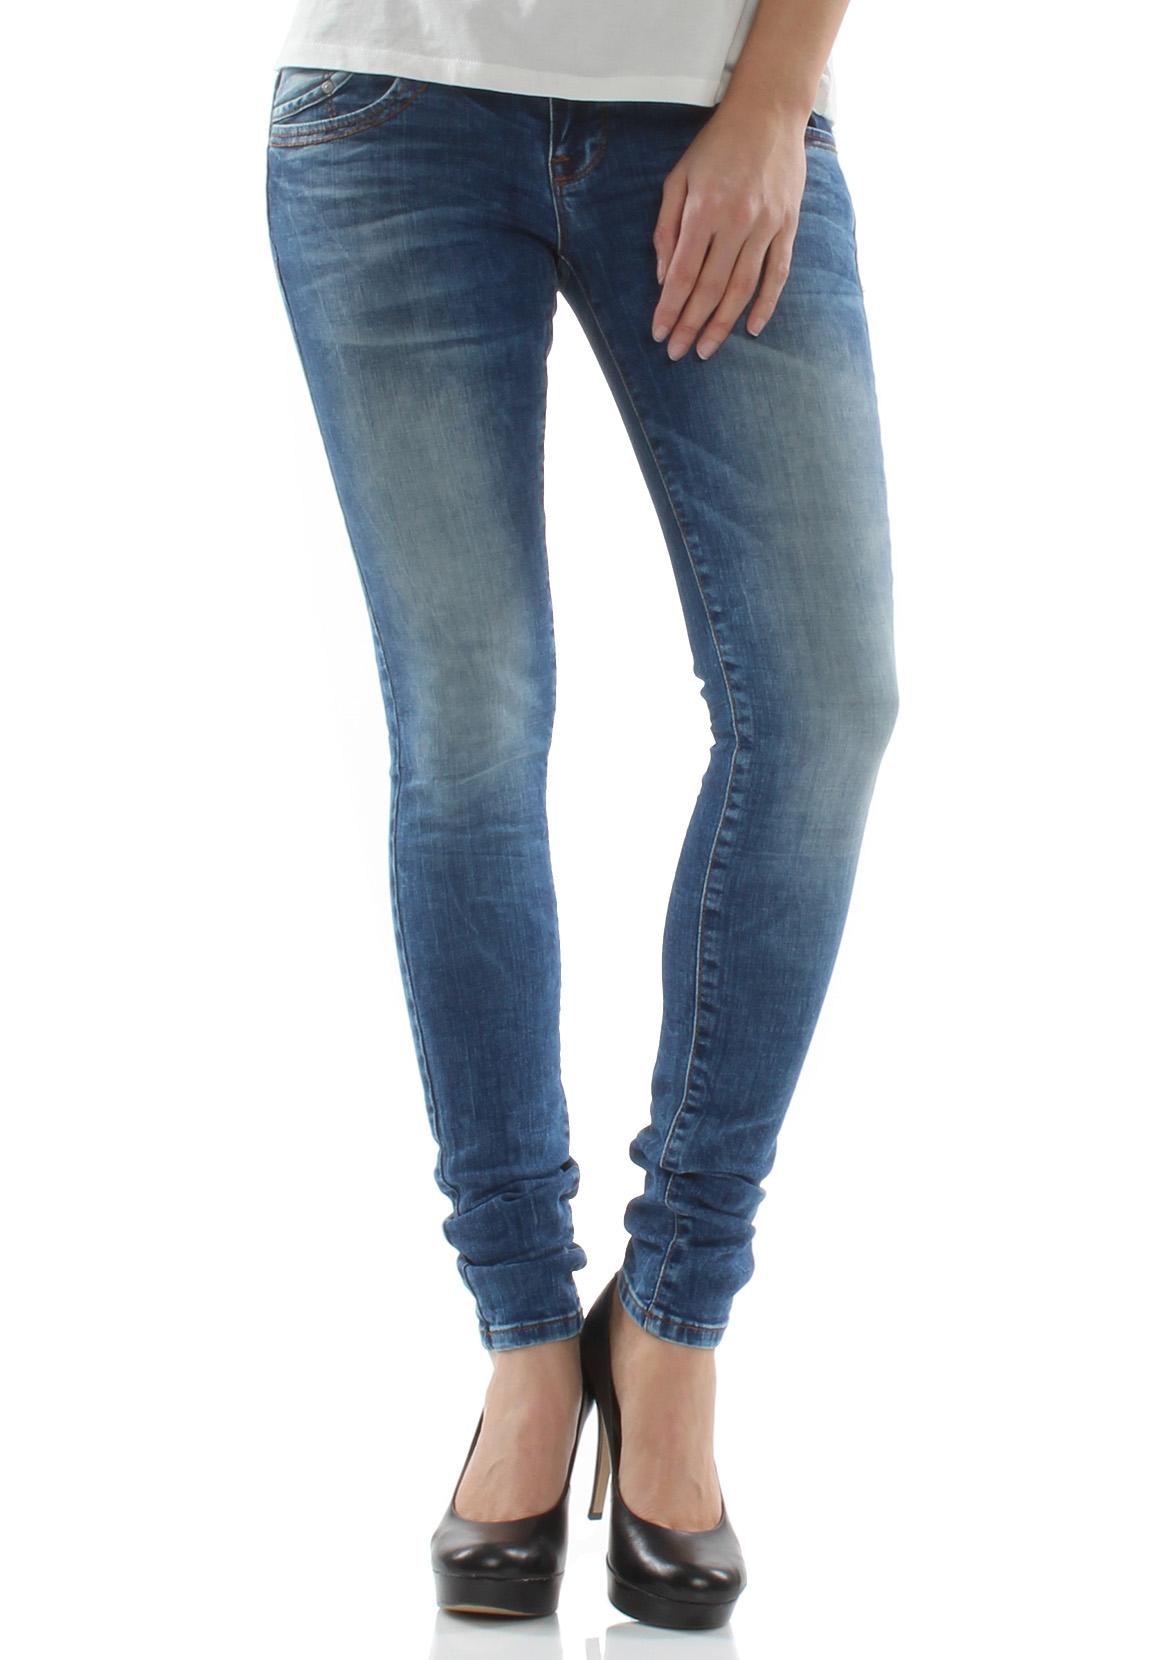 ltb jeans damen julita x angellis wash blau damen jeans hosen. Black Bedroom Furniture Sets. Home Design Ideas